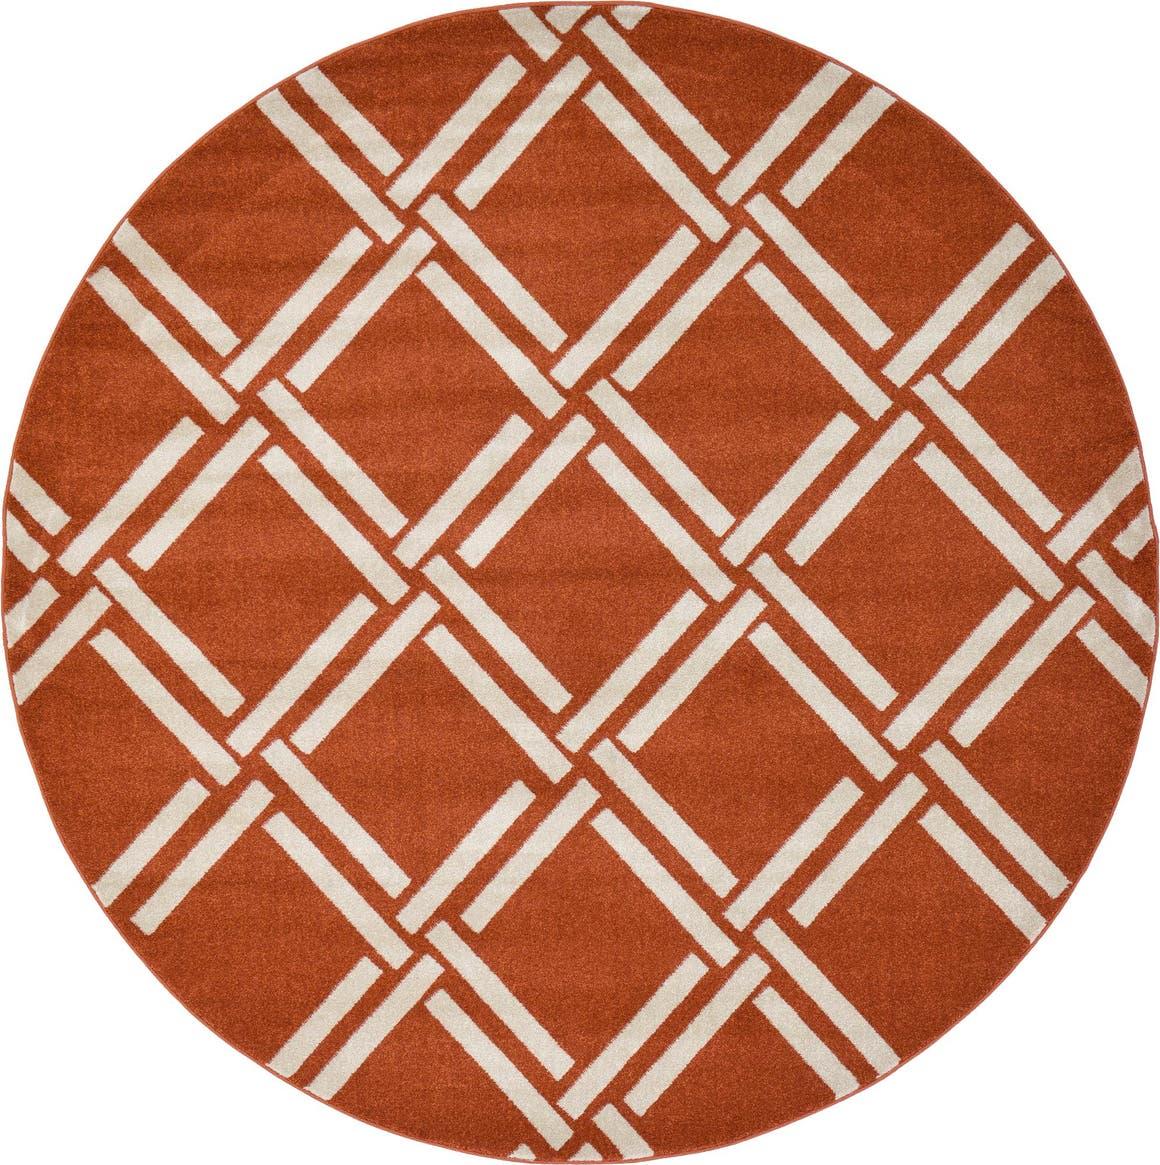 8' x 8' Trellis Round Rug main image